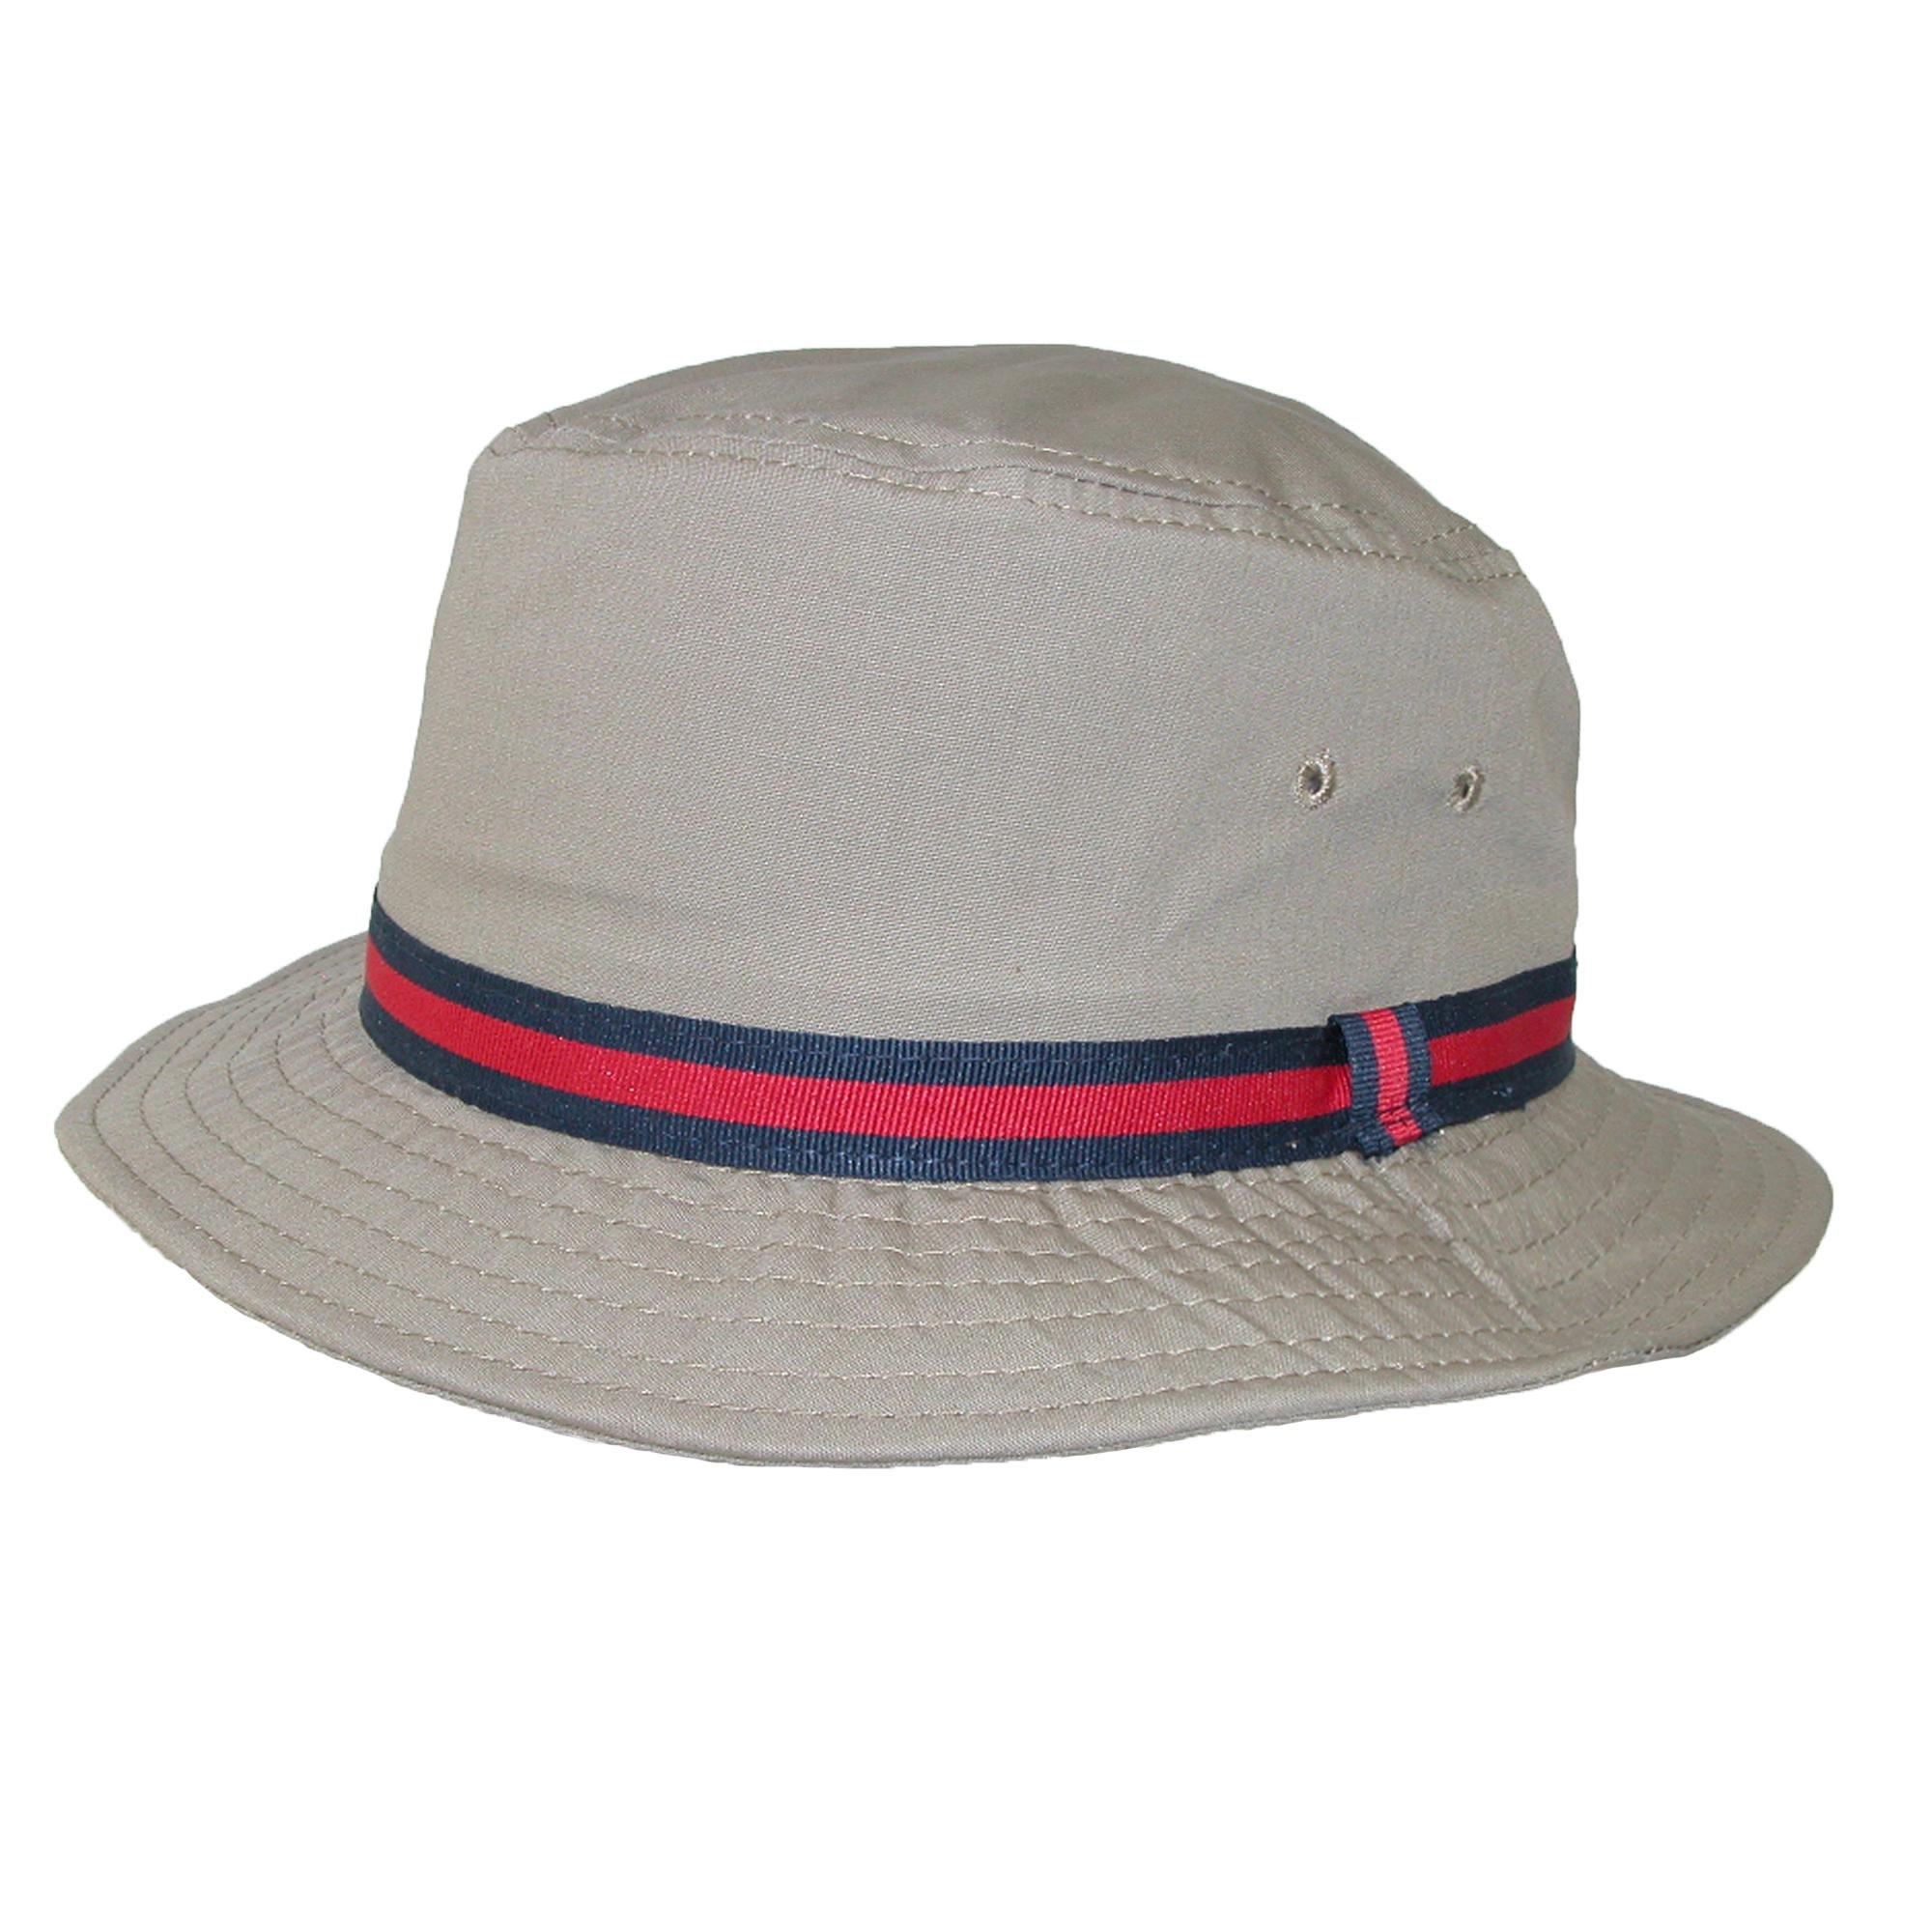 Scala Classico Rain Hat - Bucket Hat by Dorfman Pacific (British Tan Large)